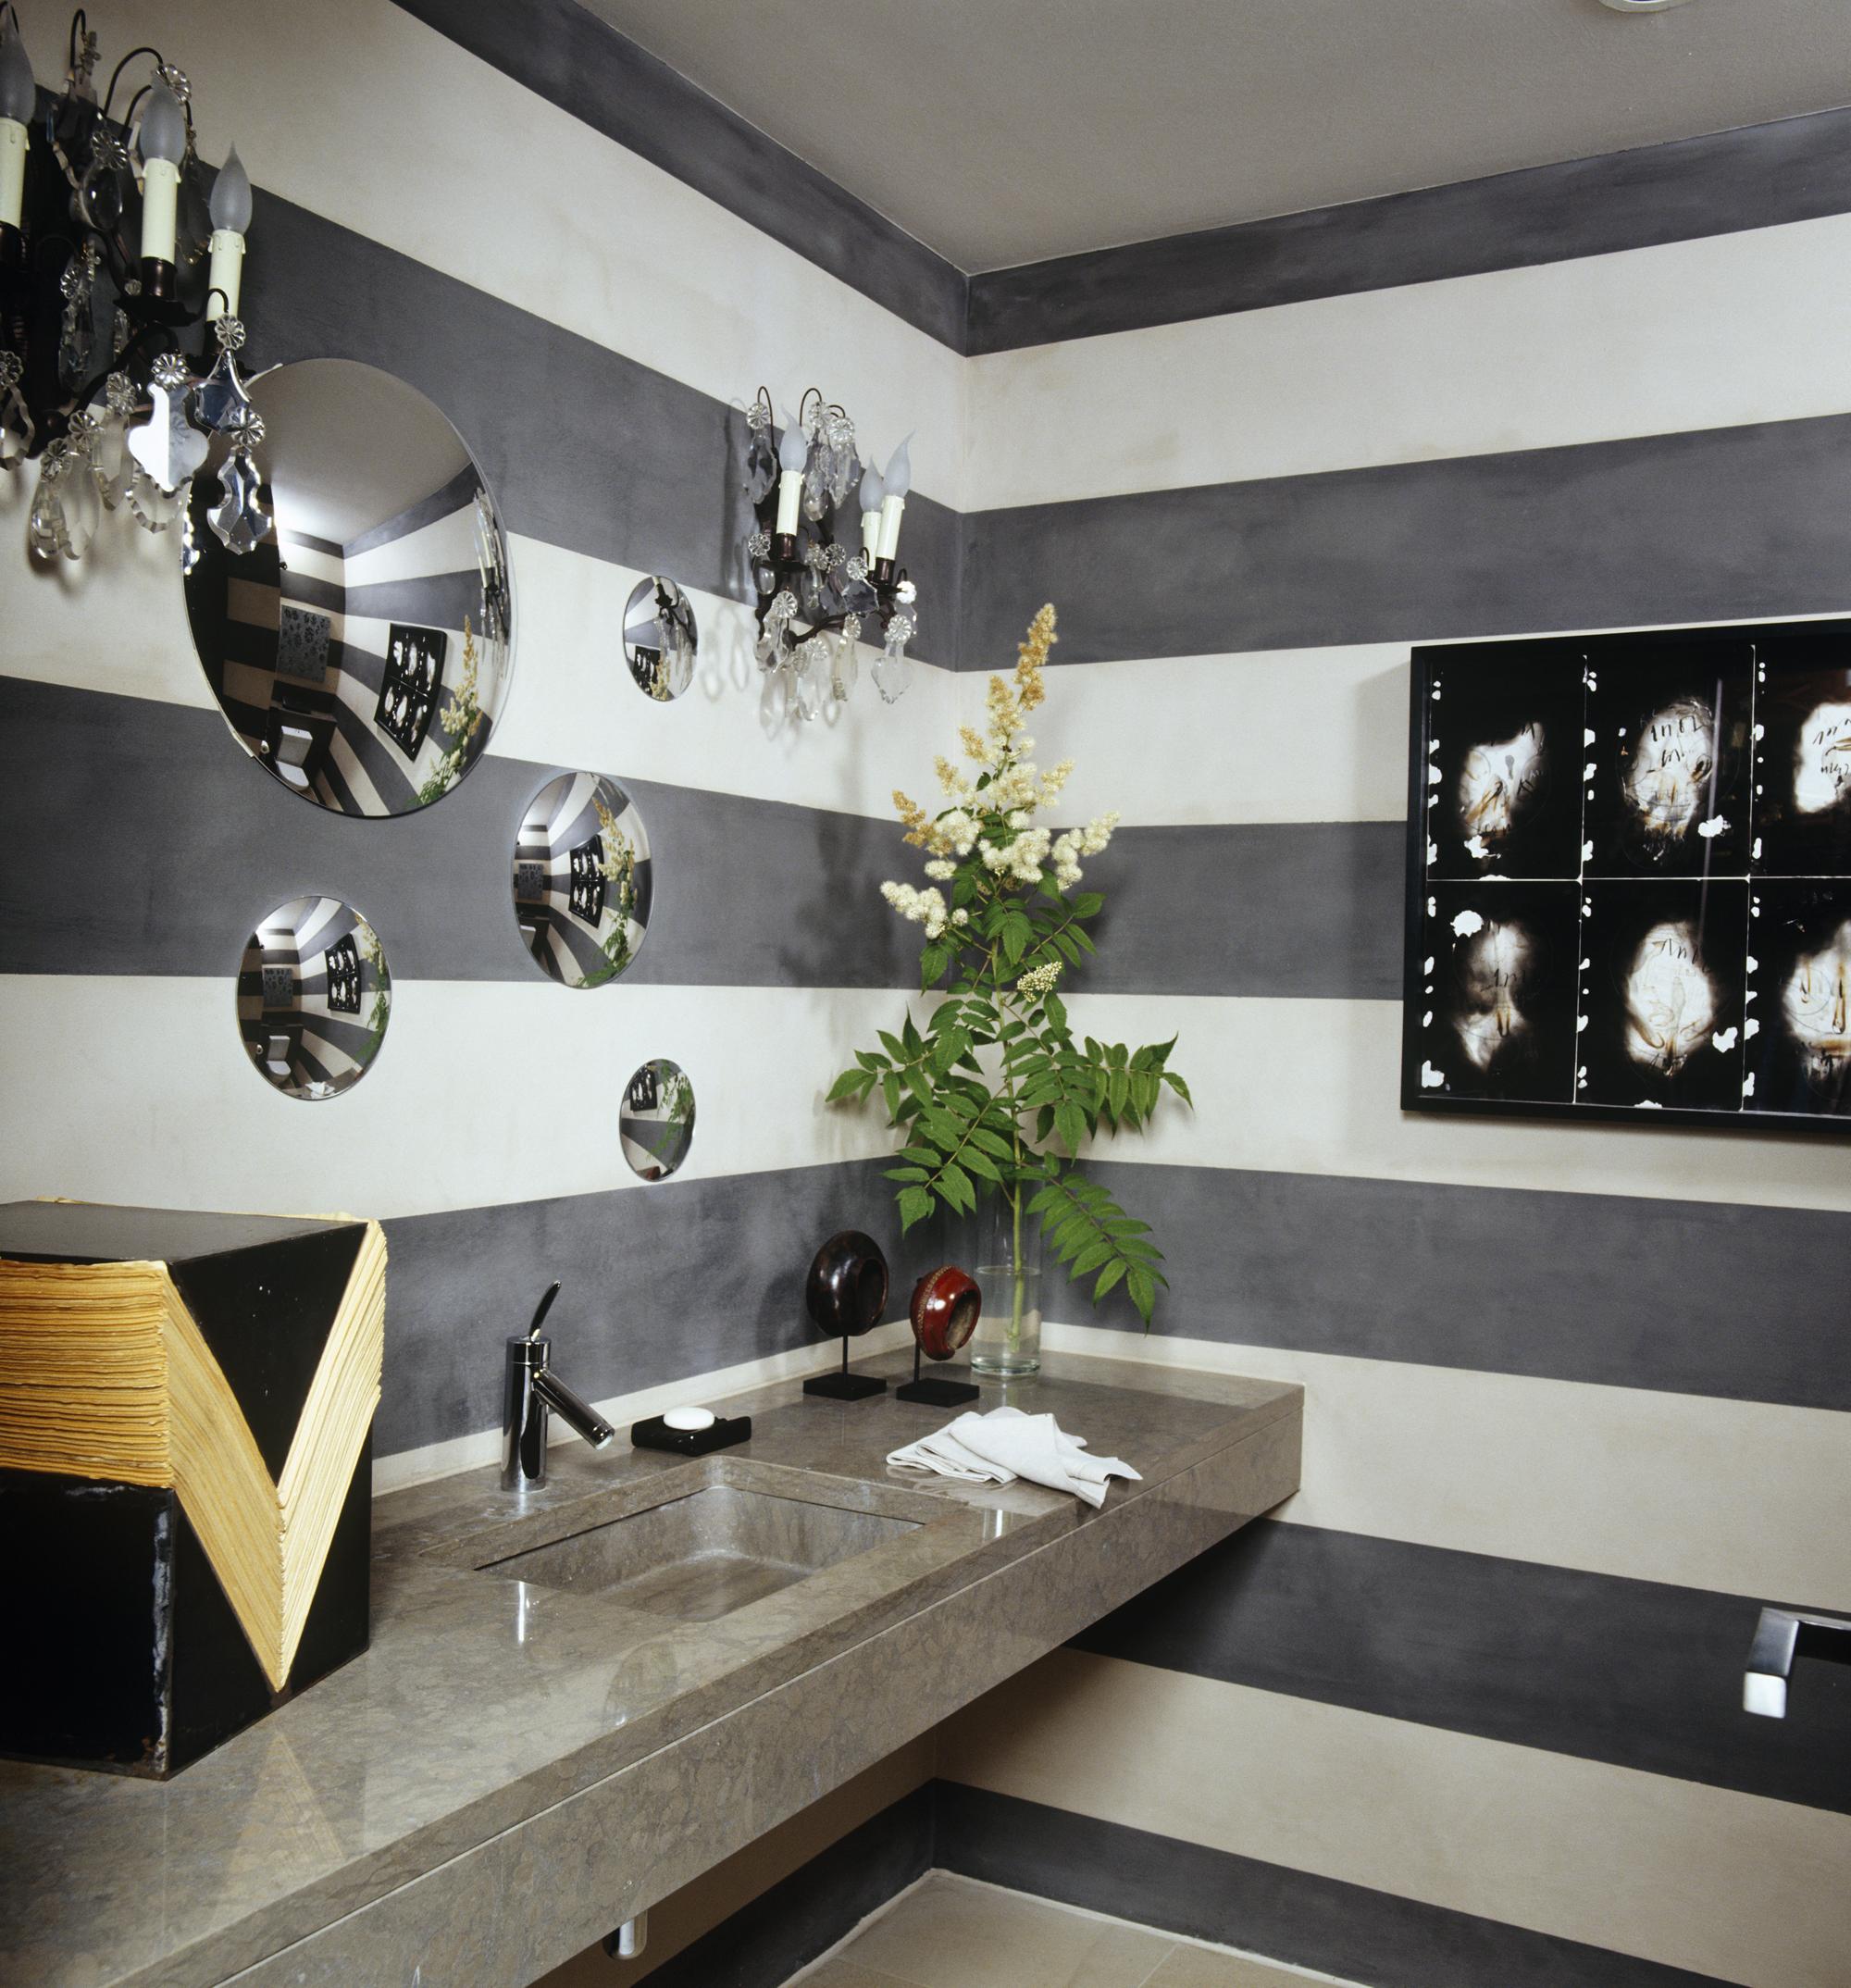 8 Small Bathroom Decorating & Design Ideas - ELLE Decor